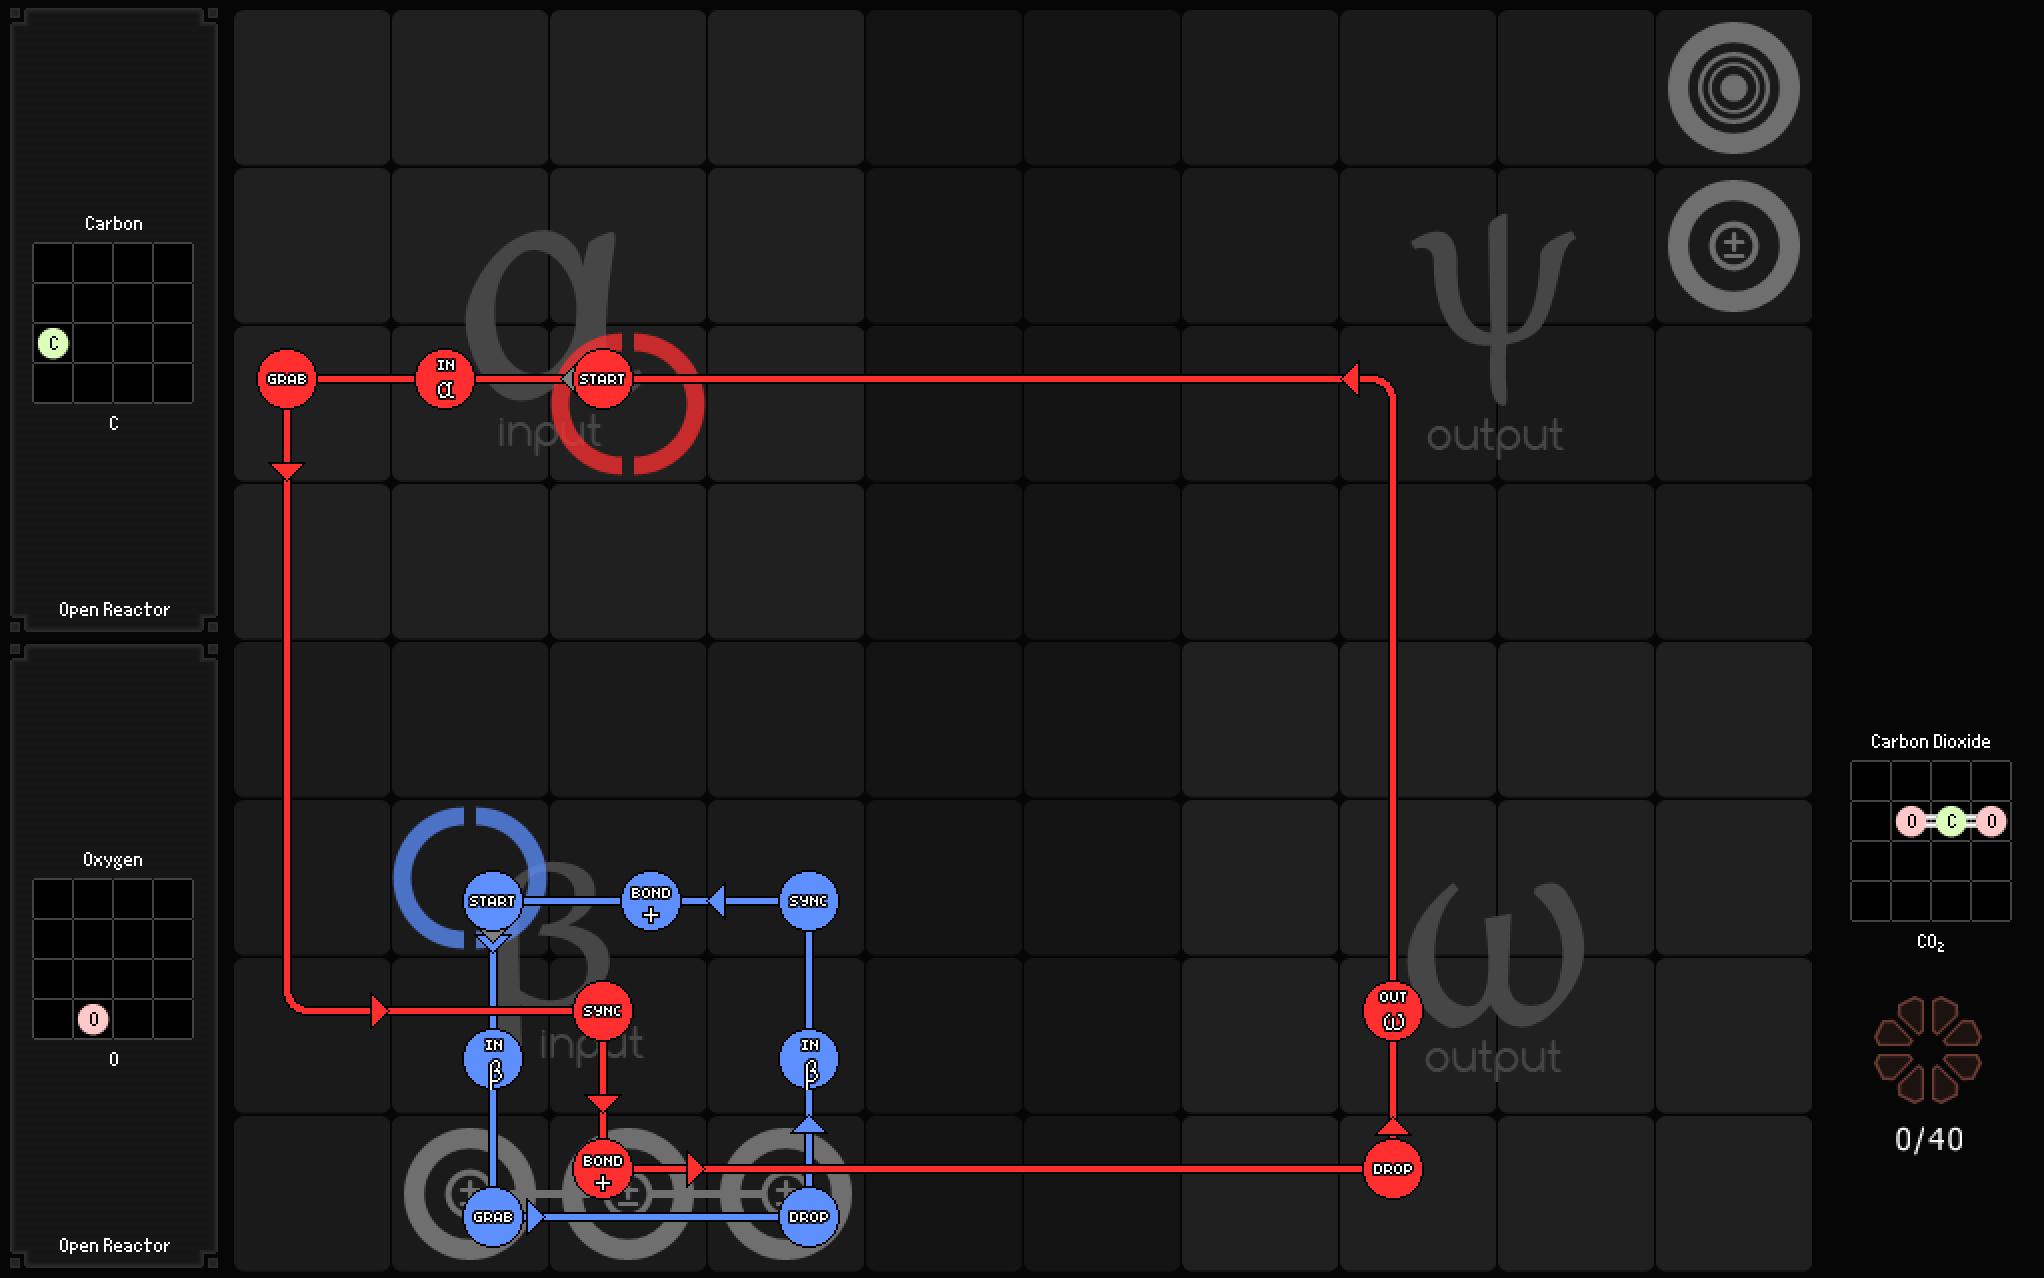 1_Story_Mode/6_Hephaestus_IV/SpaceChem-6.6.a/Reactor_5.png